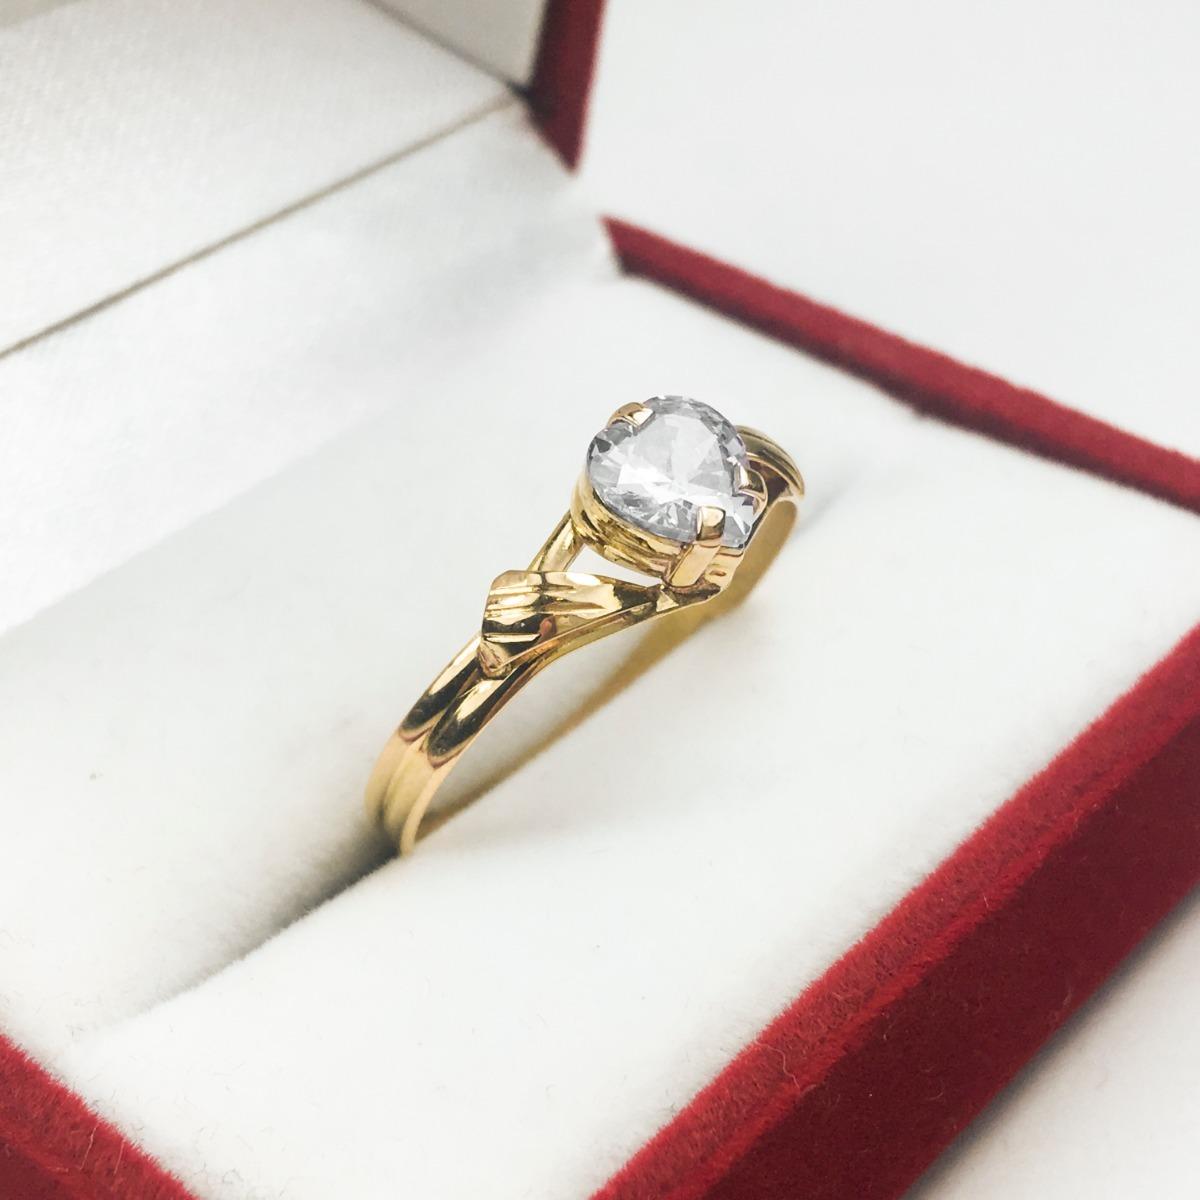 d7e9865a3f61 anillos oro 18k mujer con piedra corazon grande compromiso. Cargando zoom.